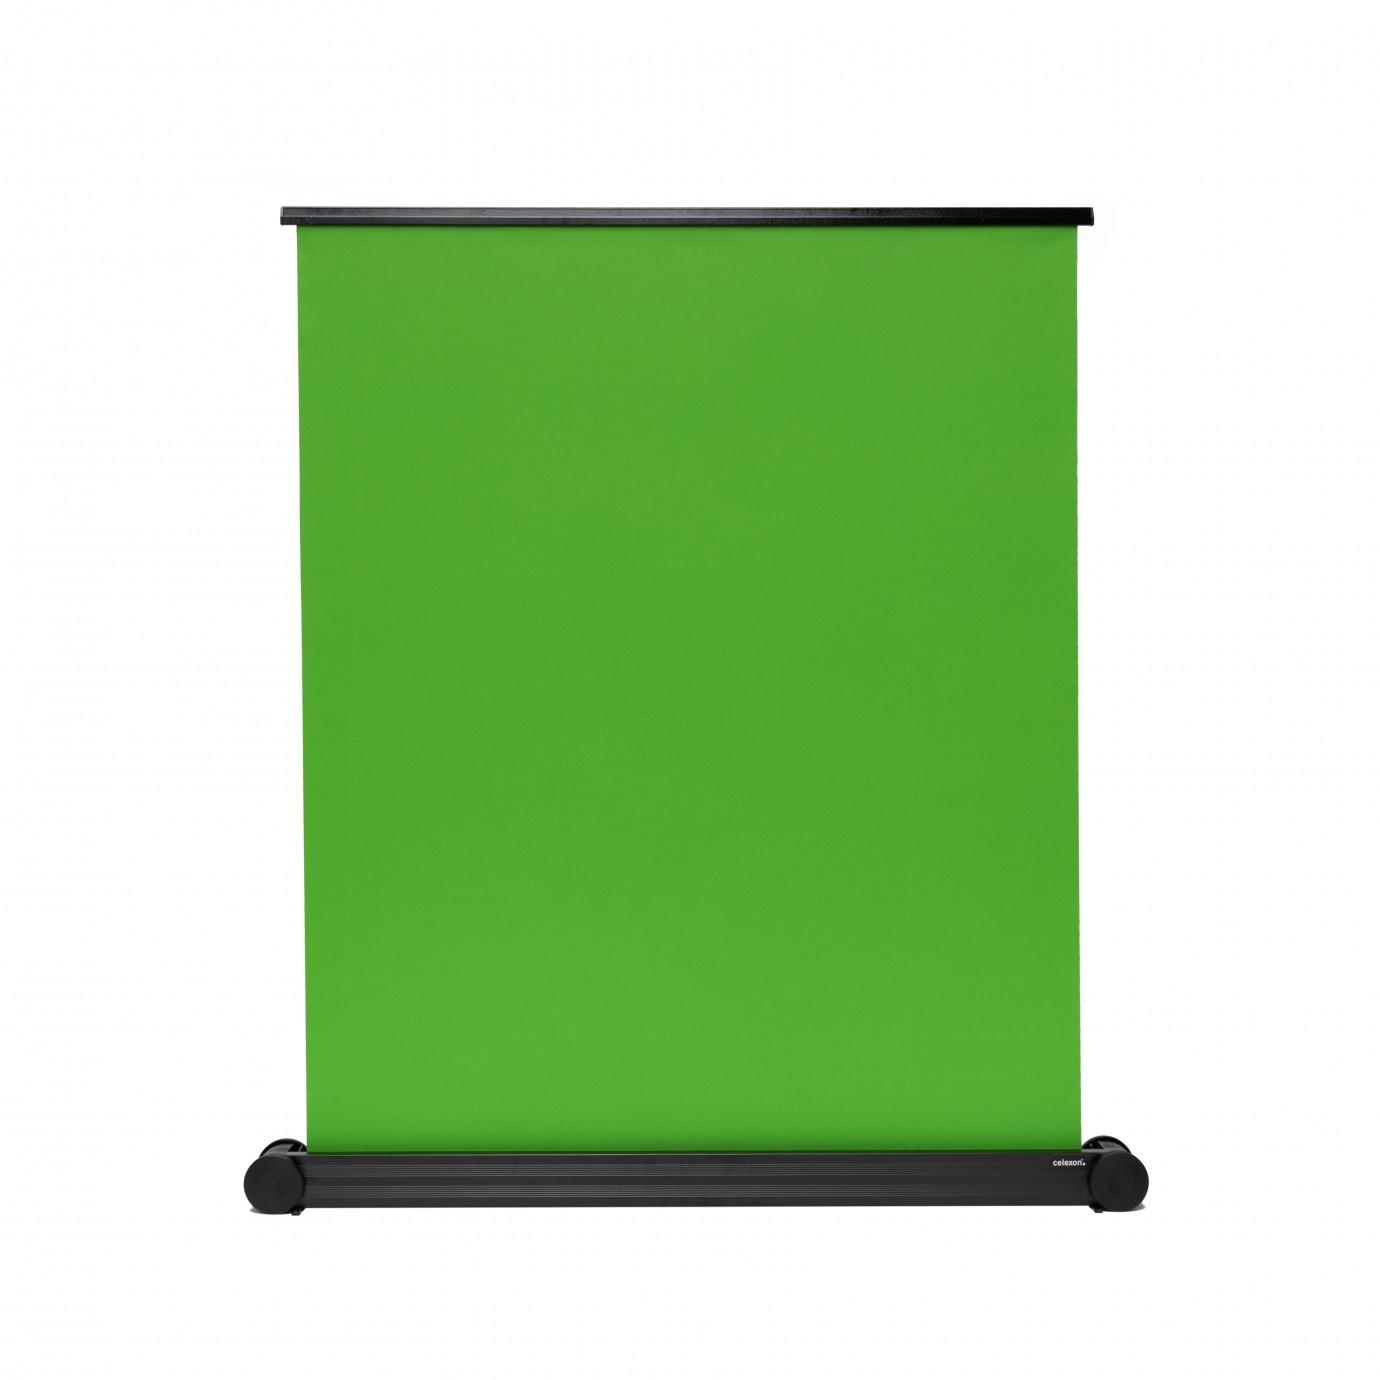 Celexon - 1000004582 - Mobile Chroma Key Green Screen - VA 150cm x 180cm - Green Screen